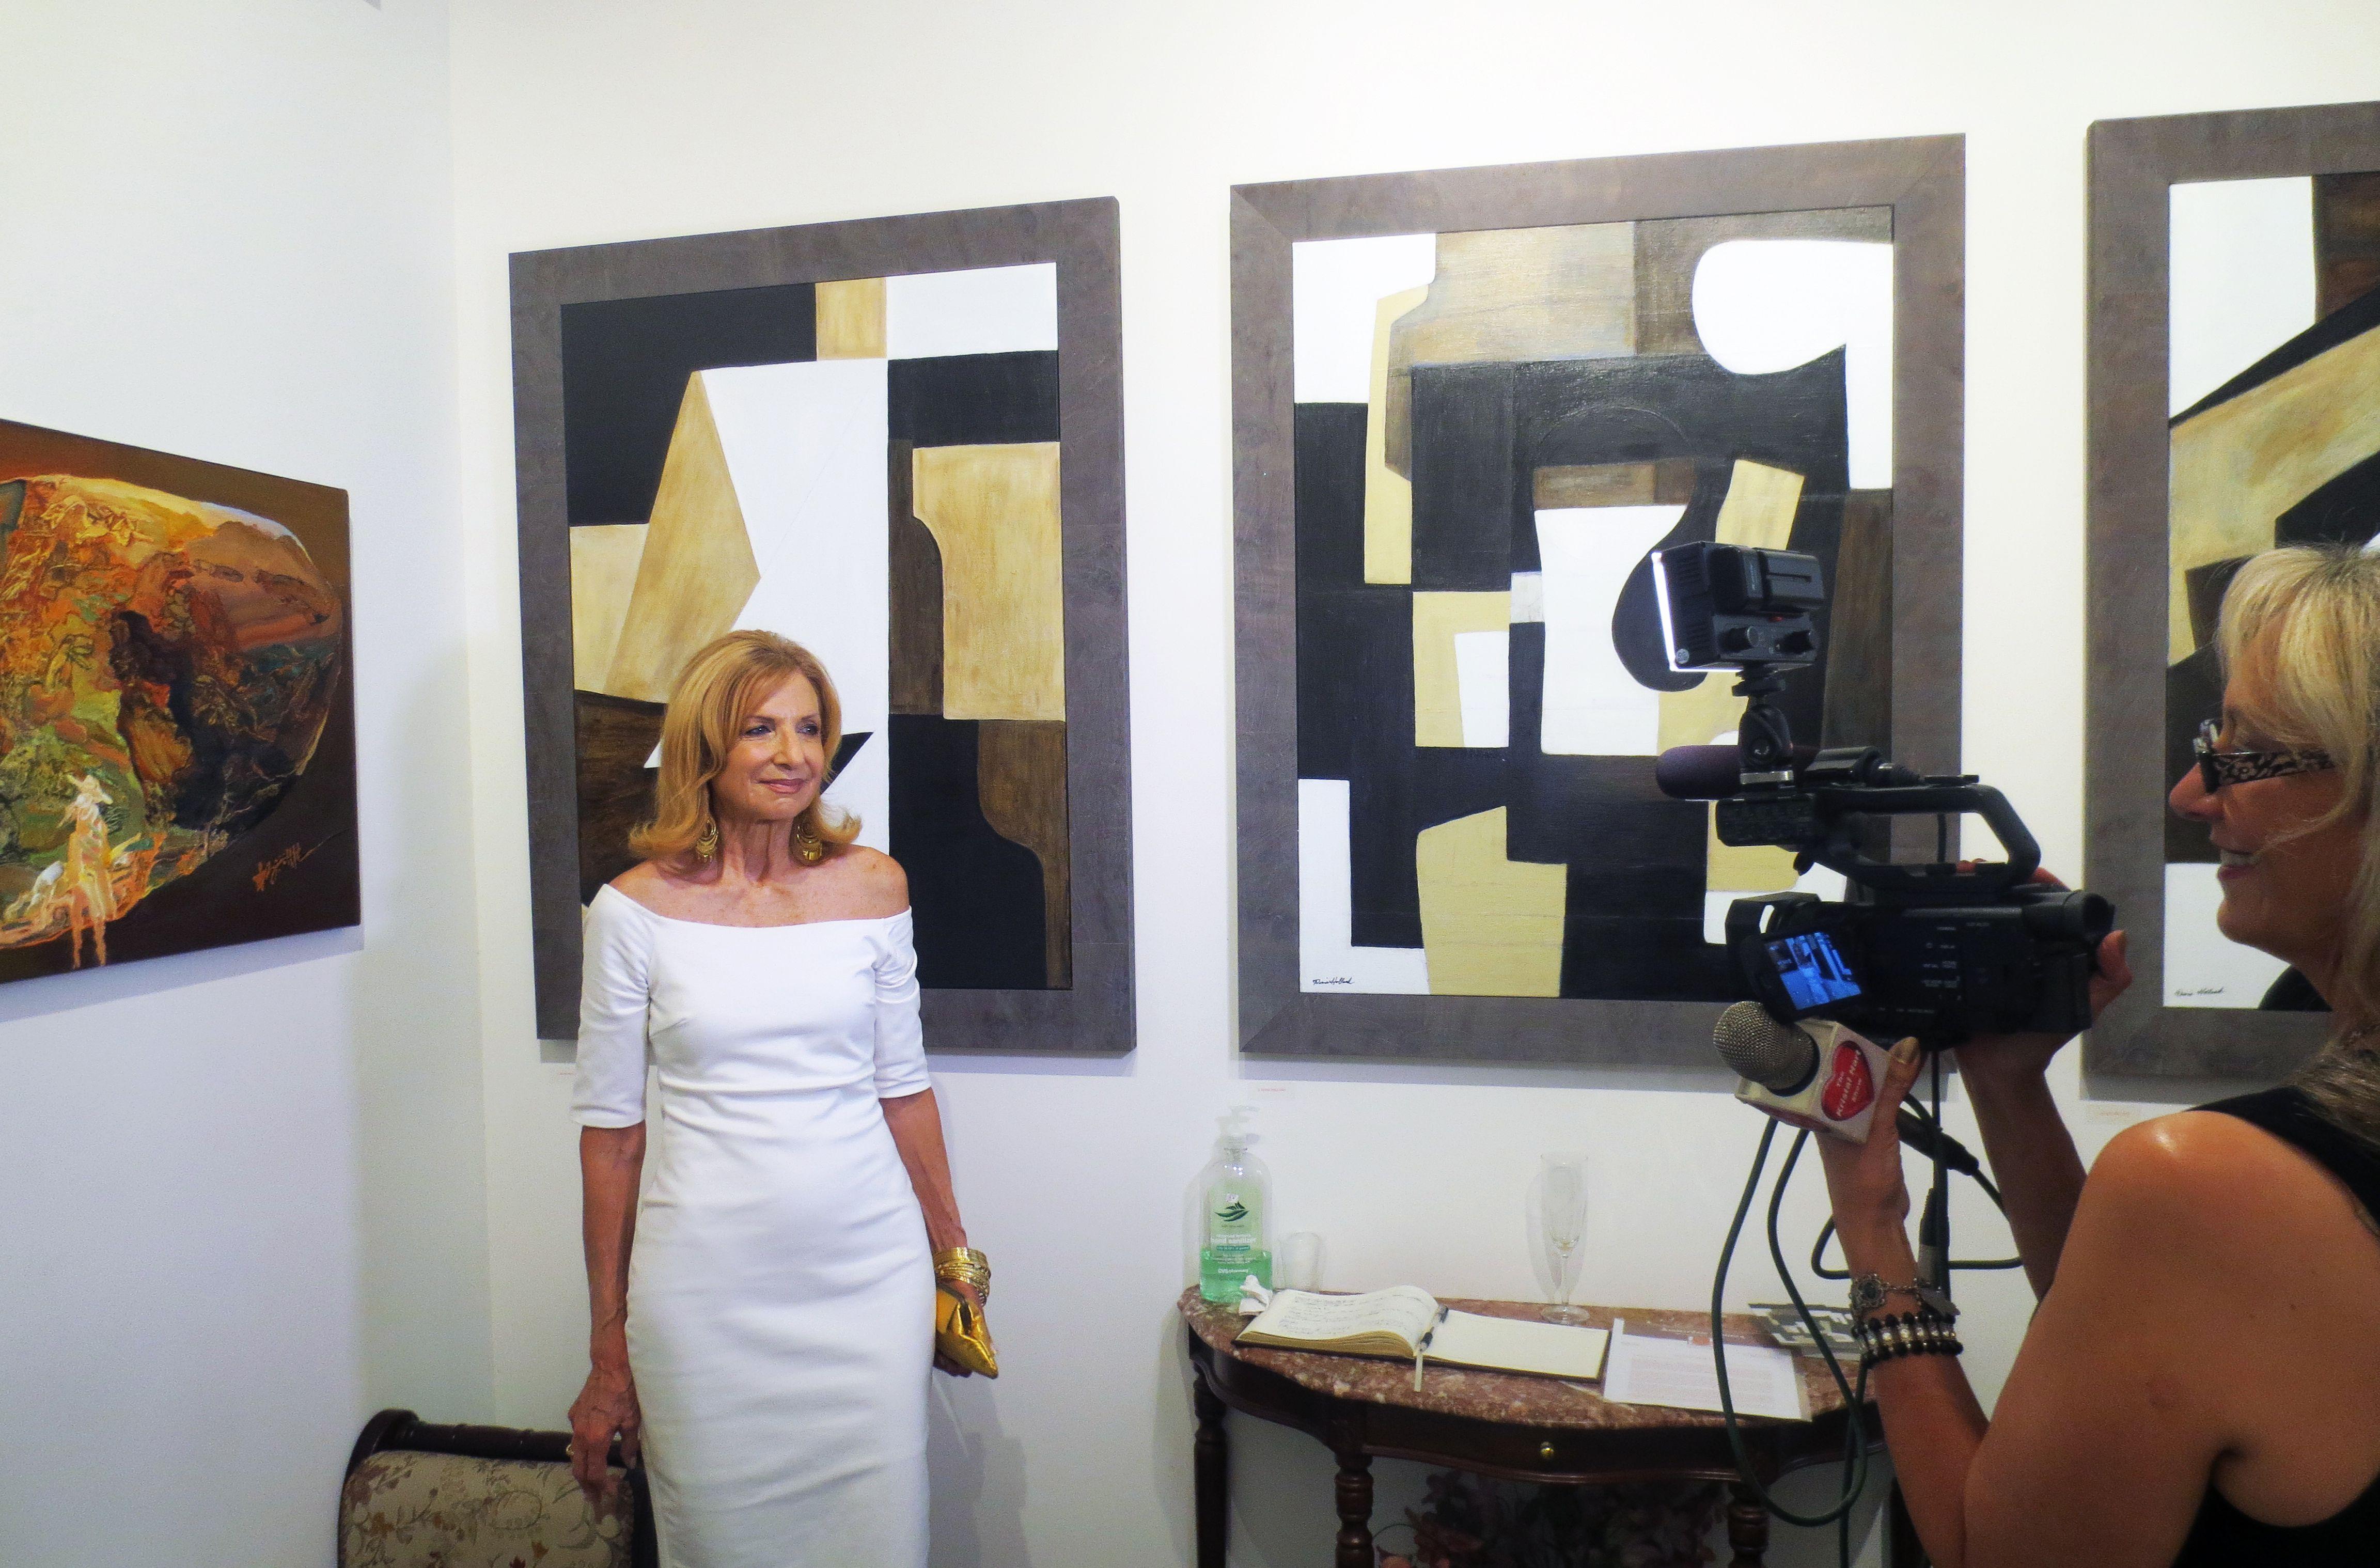 Ms kristal hart filming amsterdam whitney gallery s artist diane